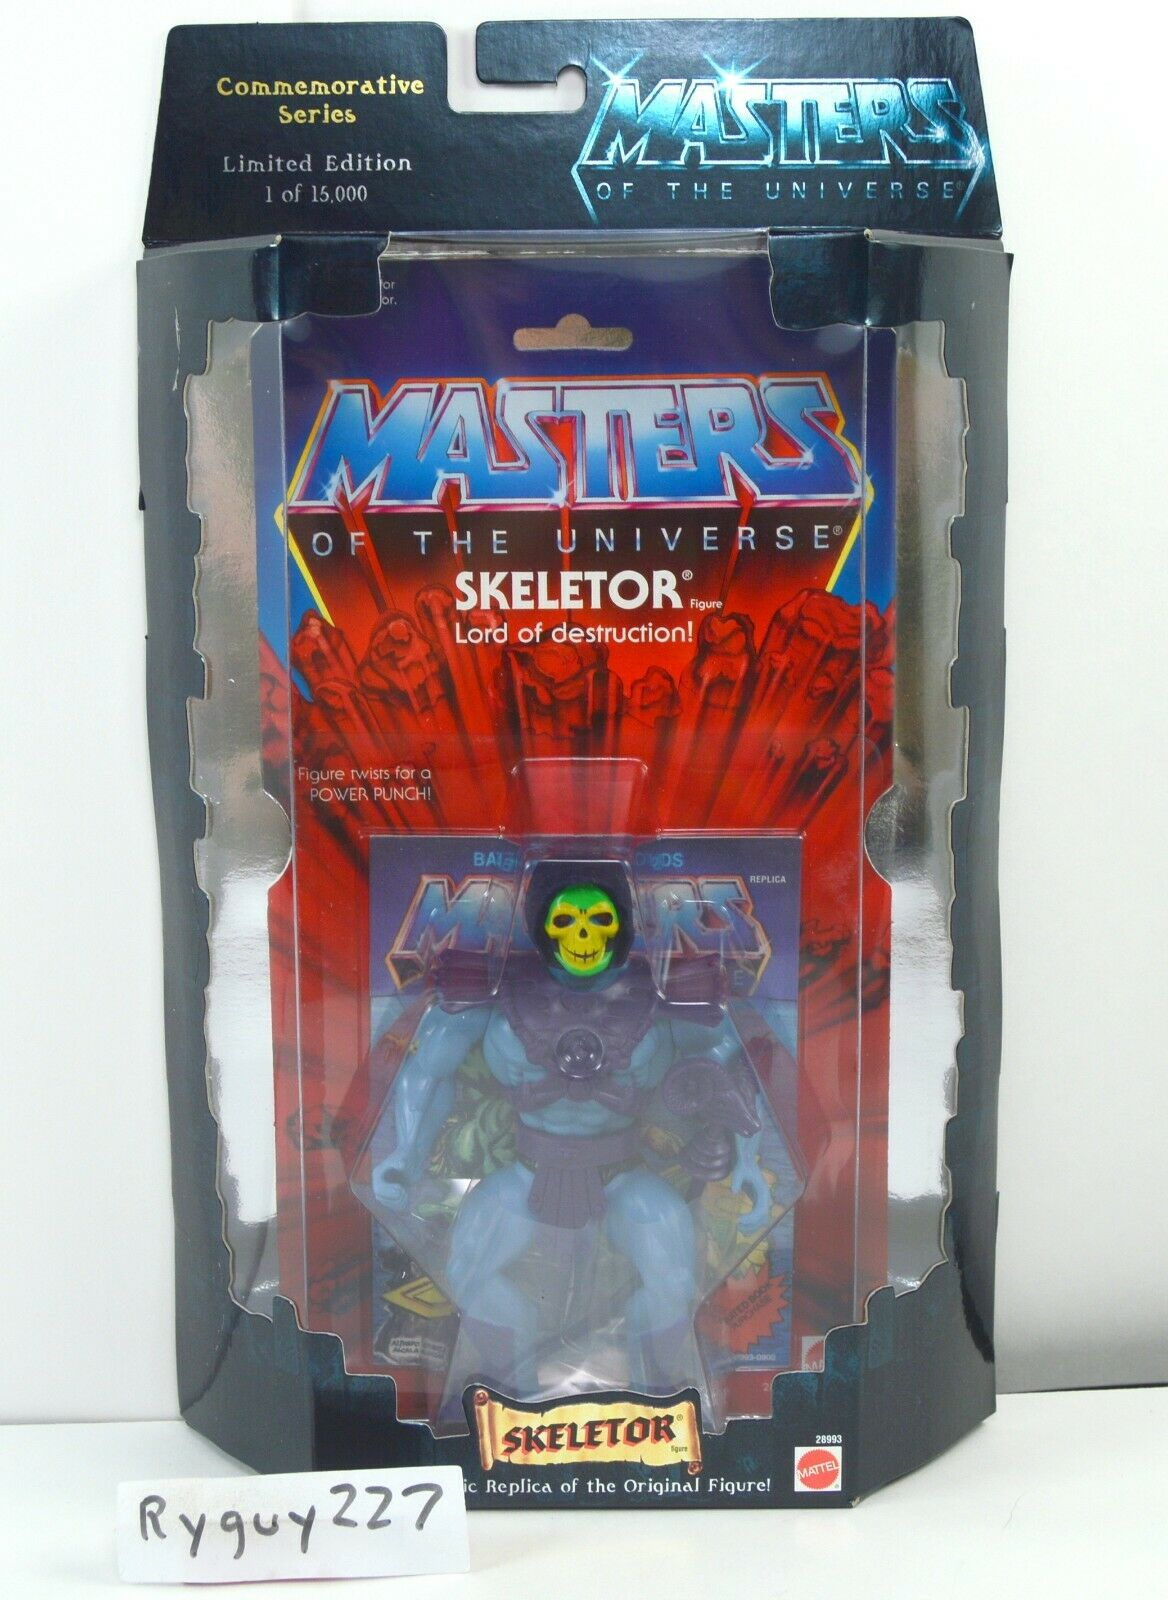 MOTU, Commemorative Skeletor, MISB, sealed box, MOC, Masters of the Universe